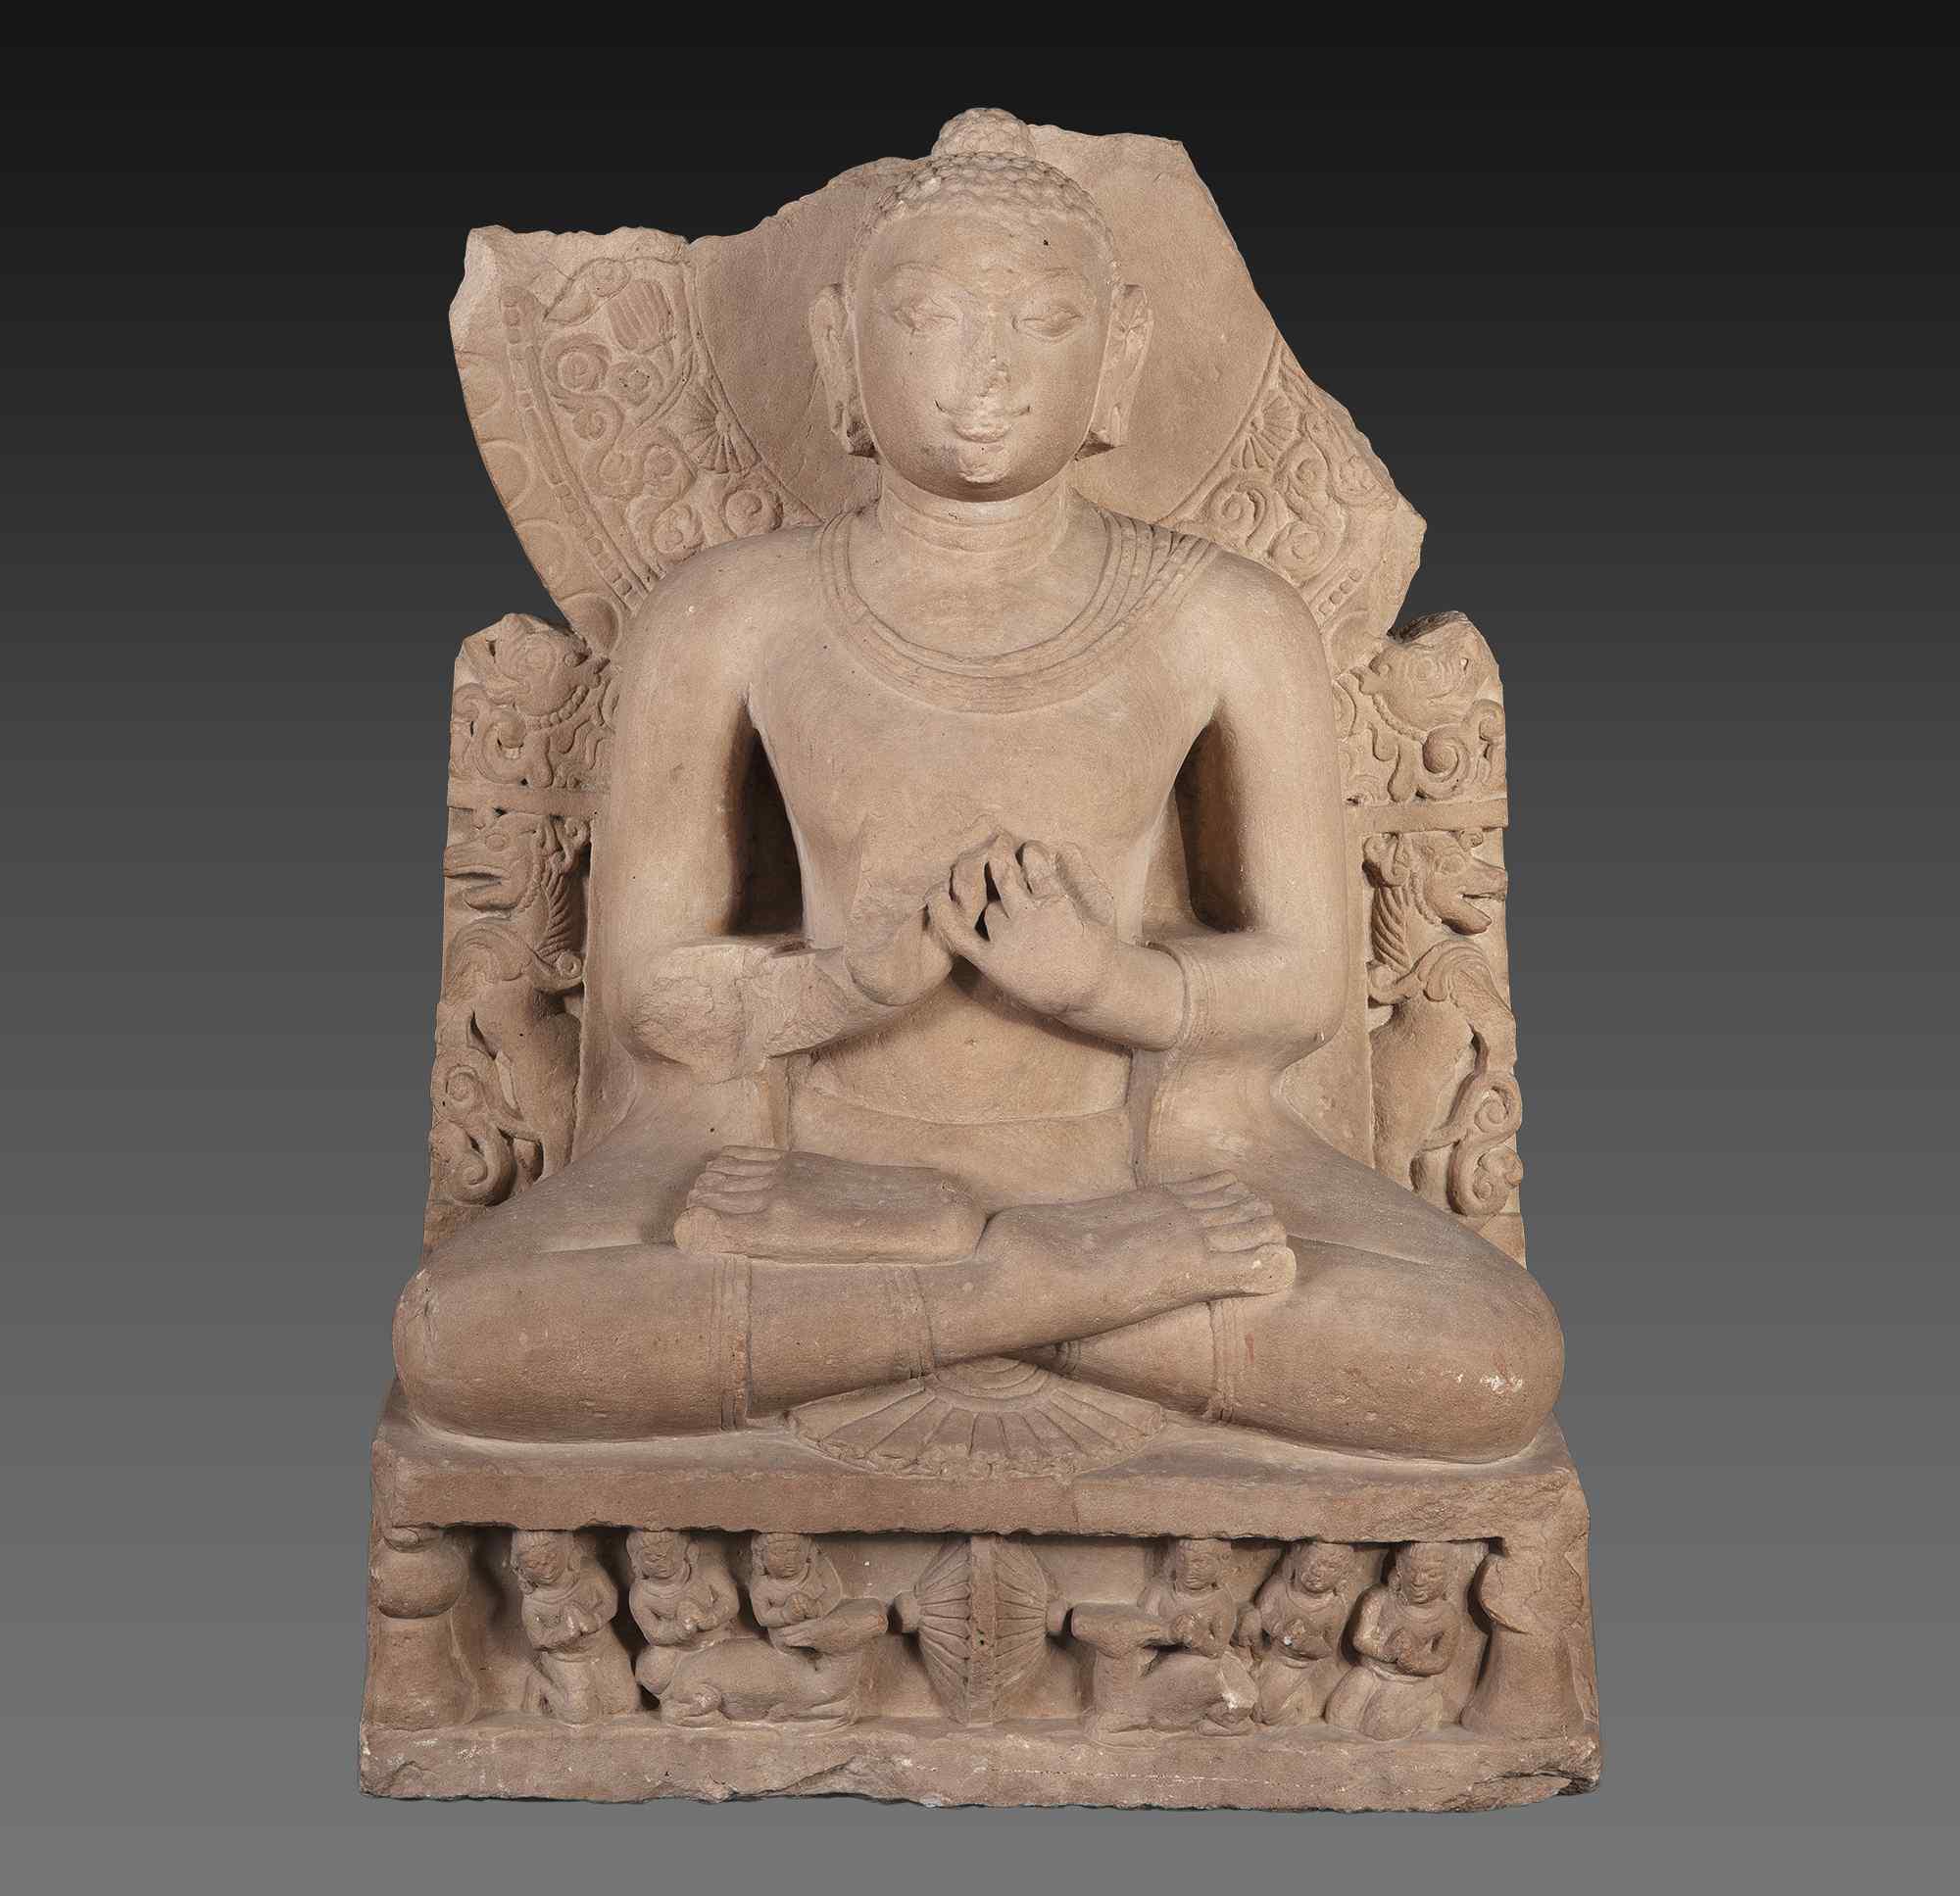 Buddha, pietra arenaria, periodo Gupta, India. IV-V secolo.